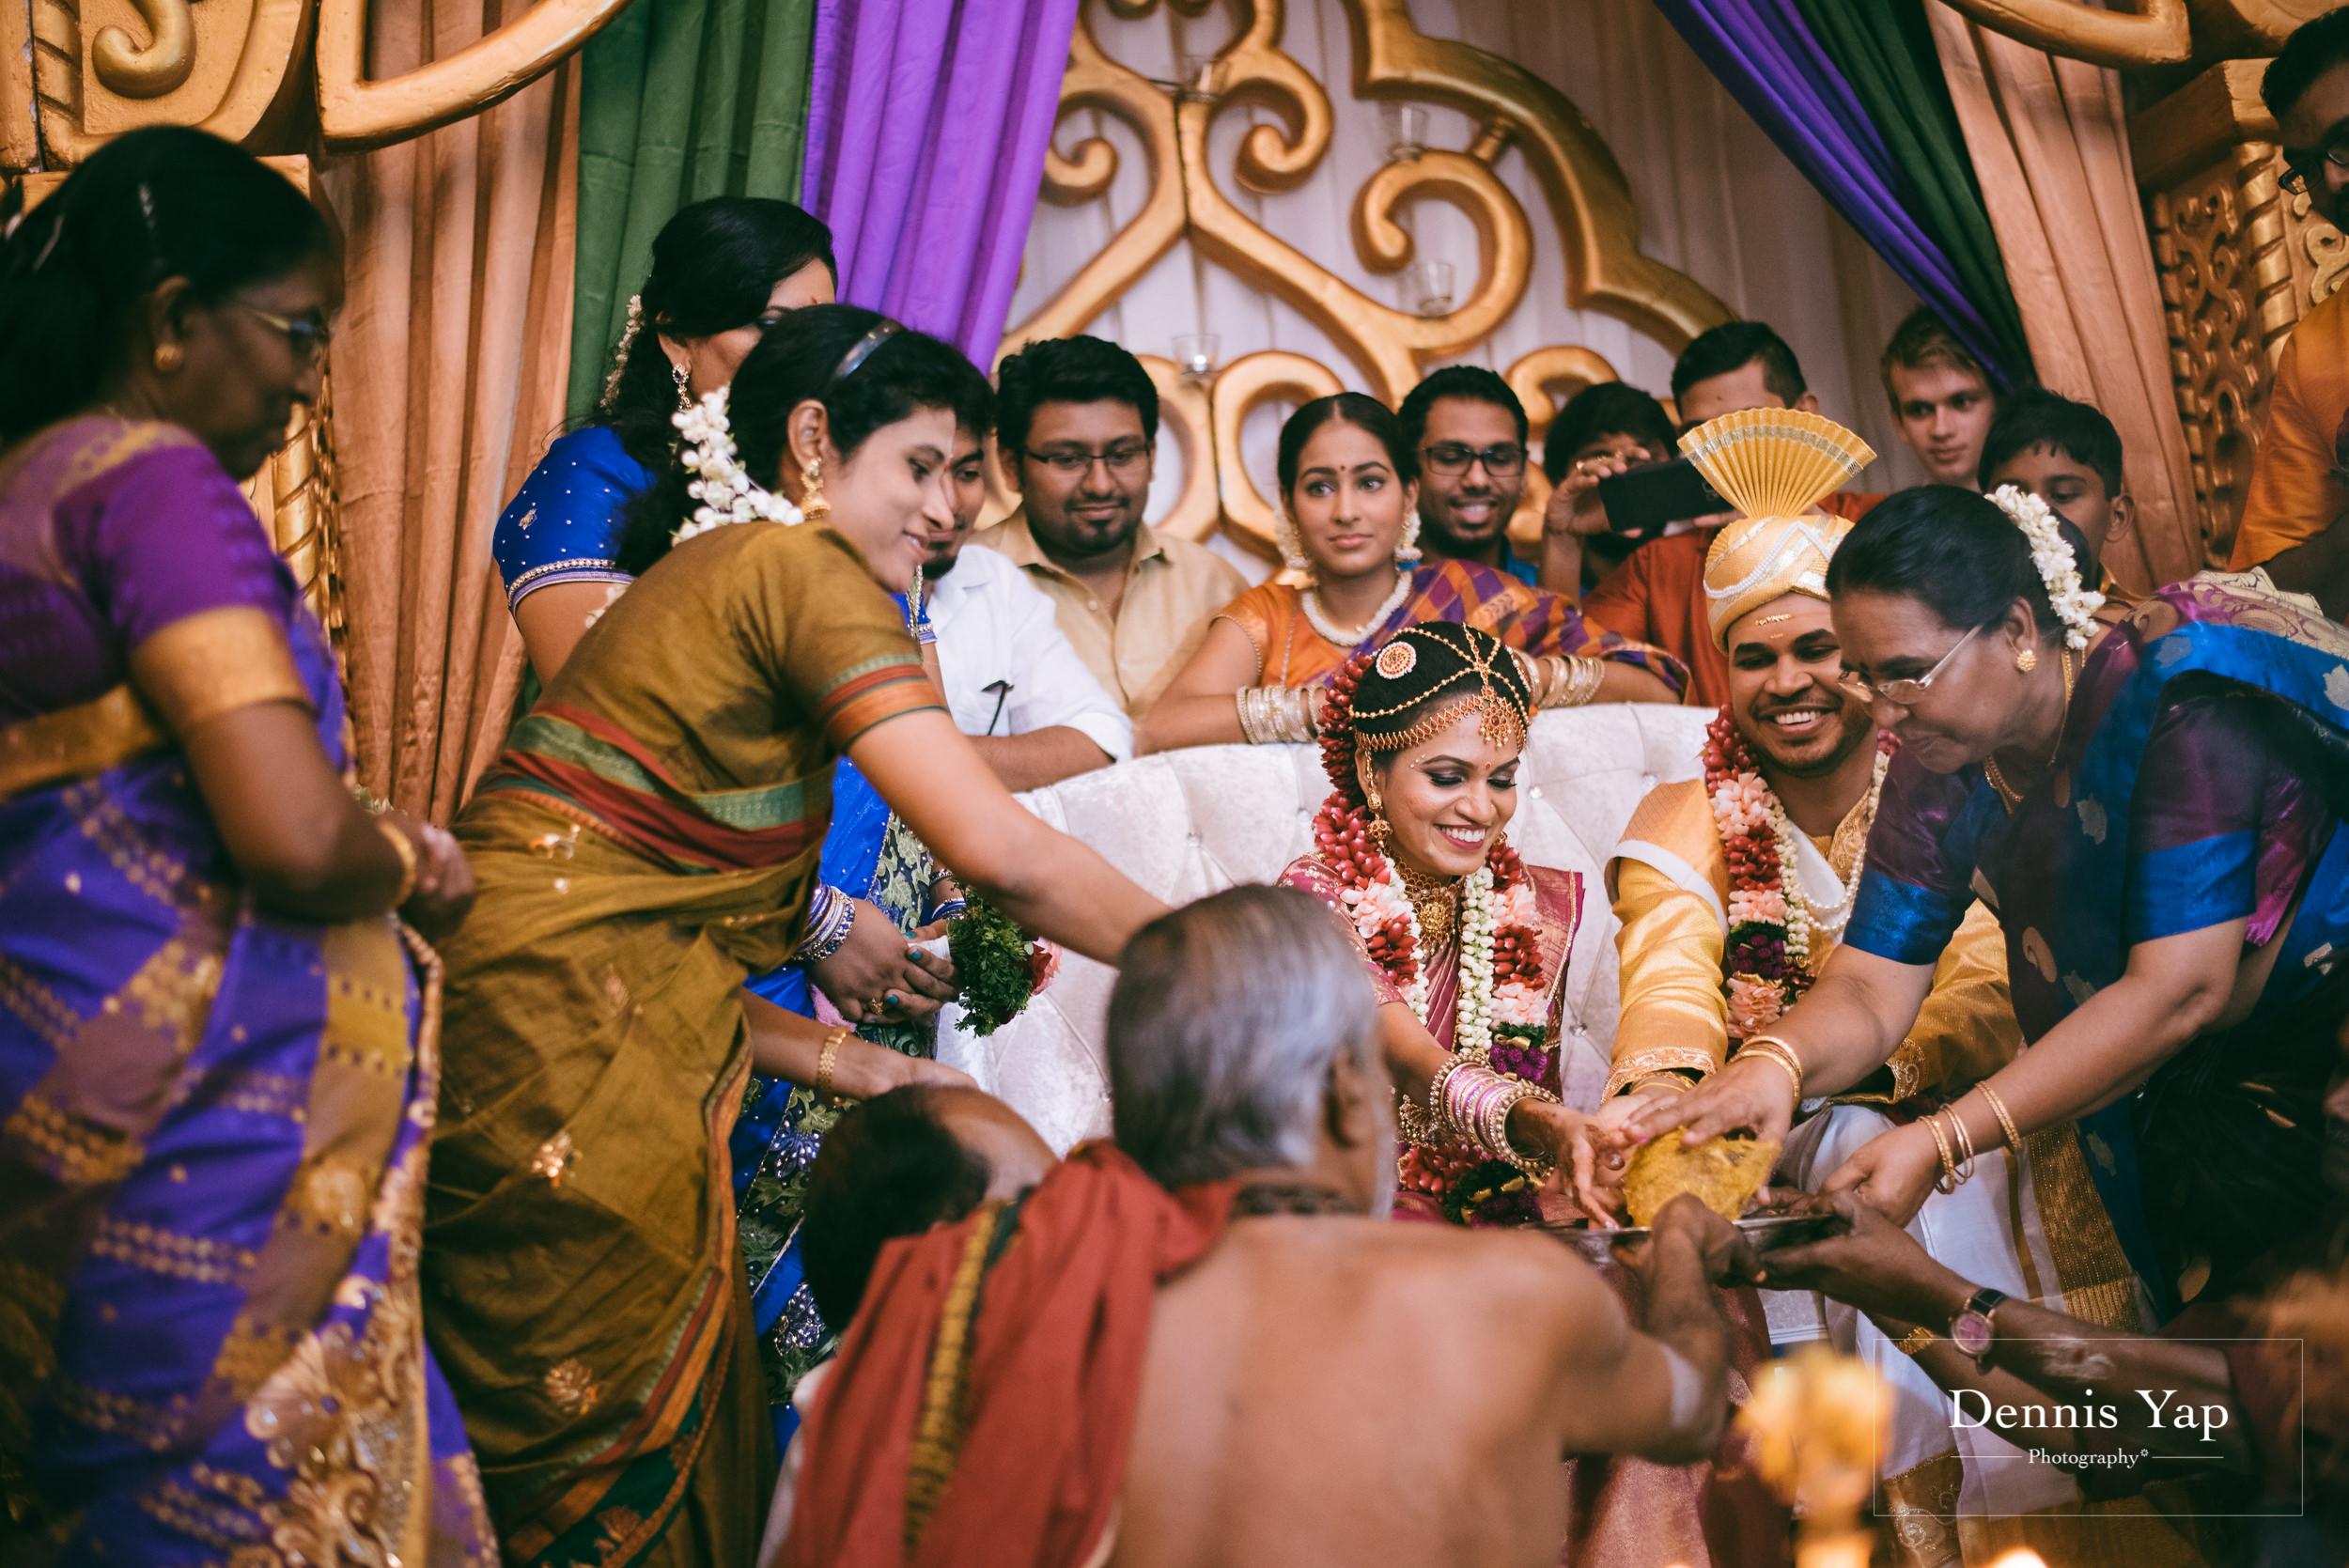 puvaneswaran cangitaa indian wedding ceremony ideal convention dennis yap photography malaysia-22.jpg